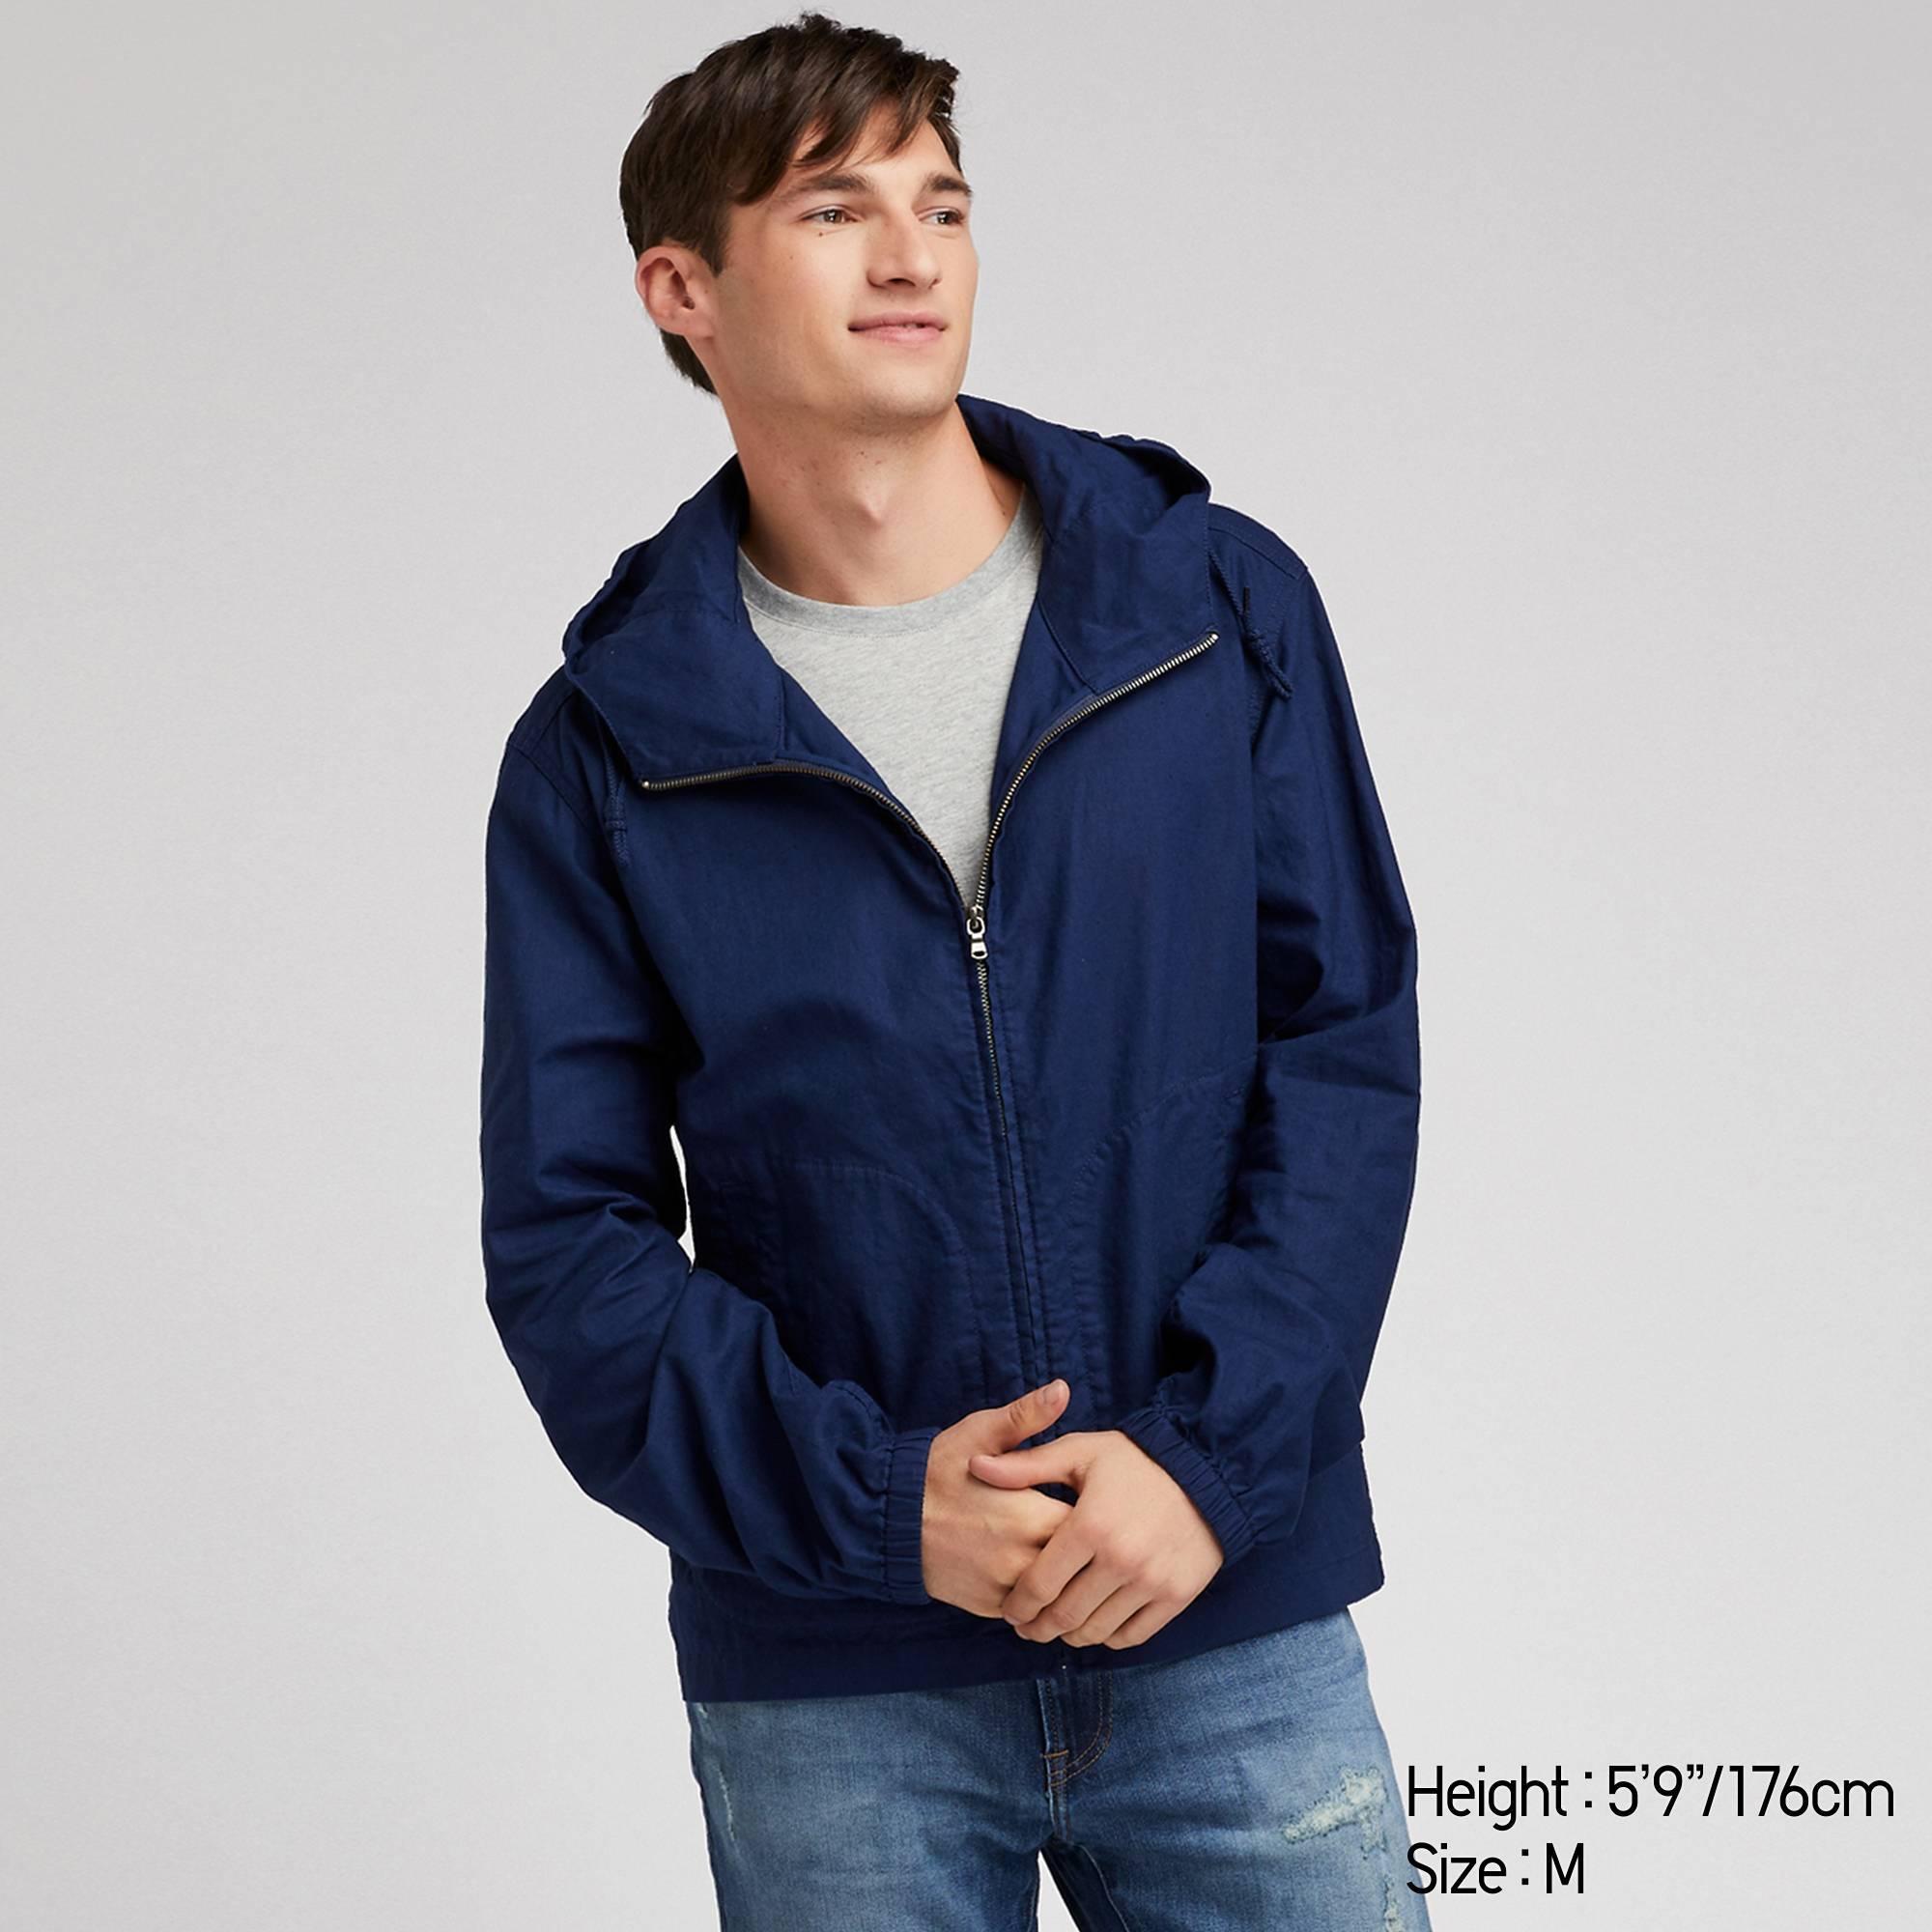 d57343894cf0 Lyst - Uniqlo Men Linen Cotton Full-zip Parka in Blue for Men